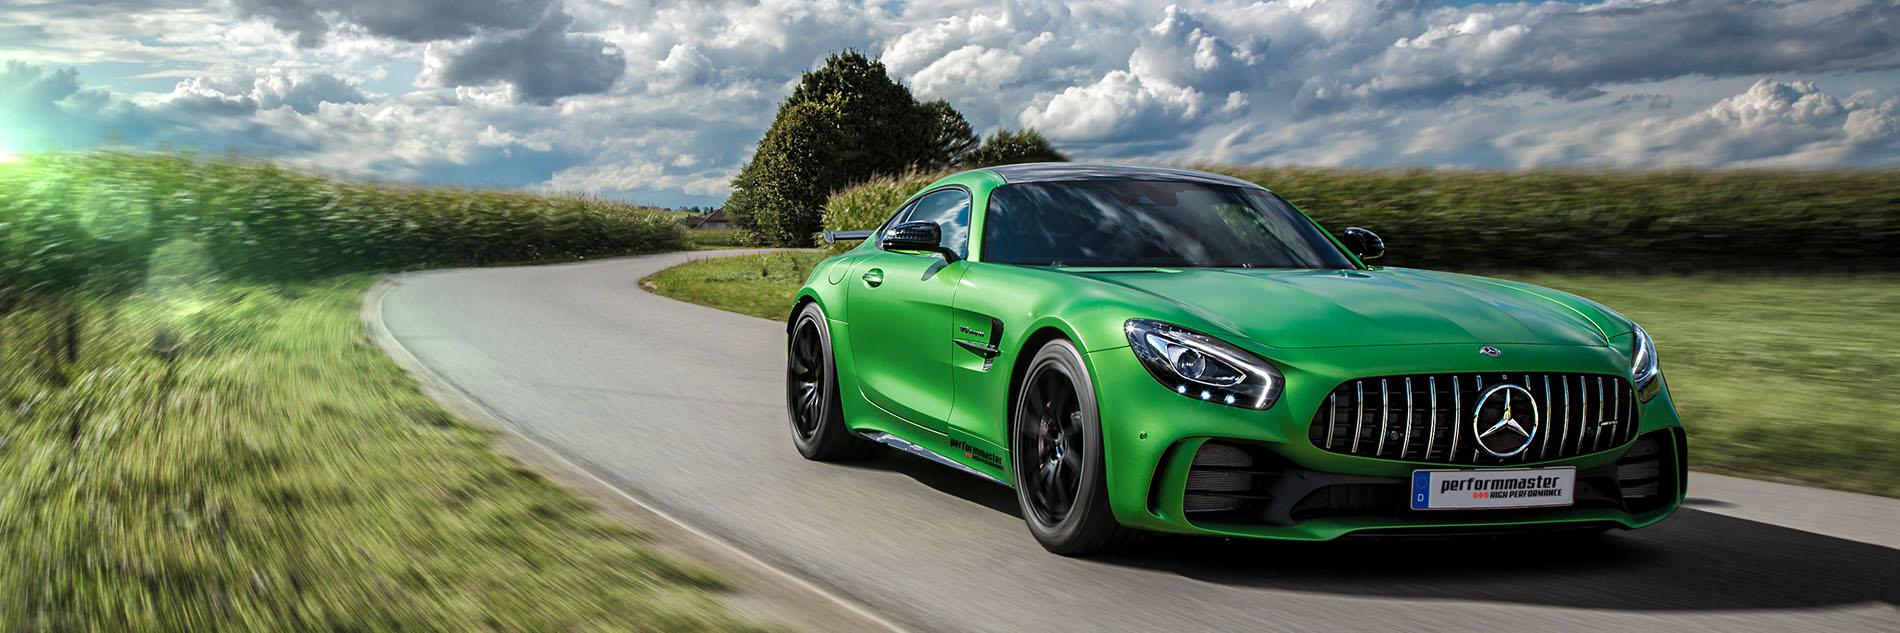 Tuning für Mercedes-AMG GT R